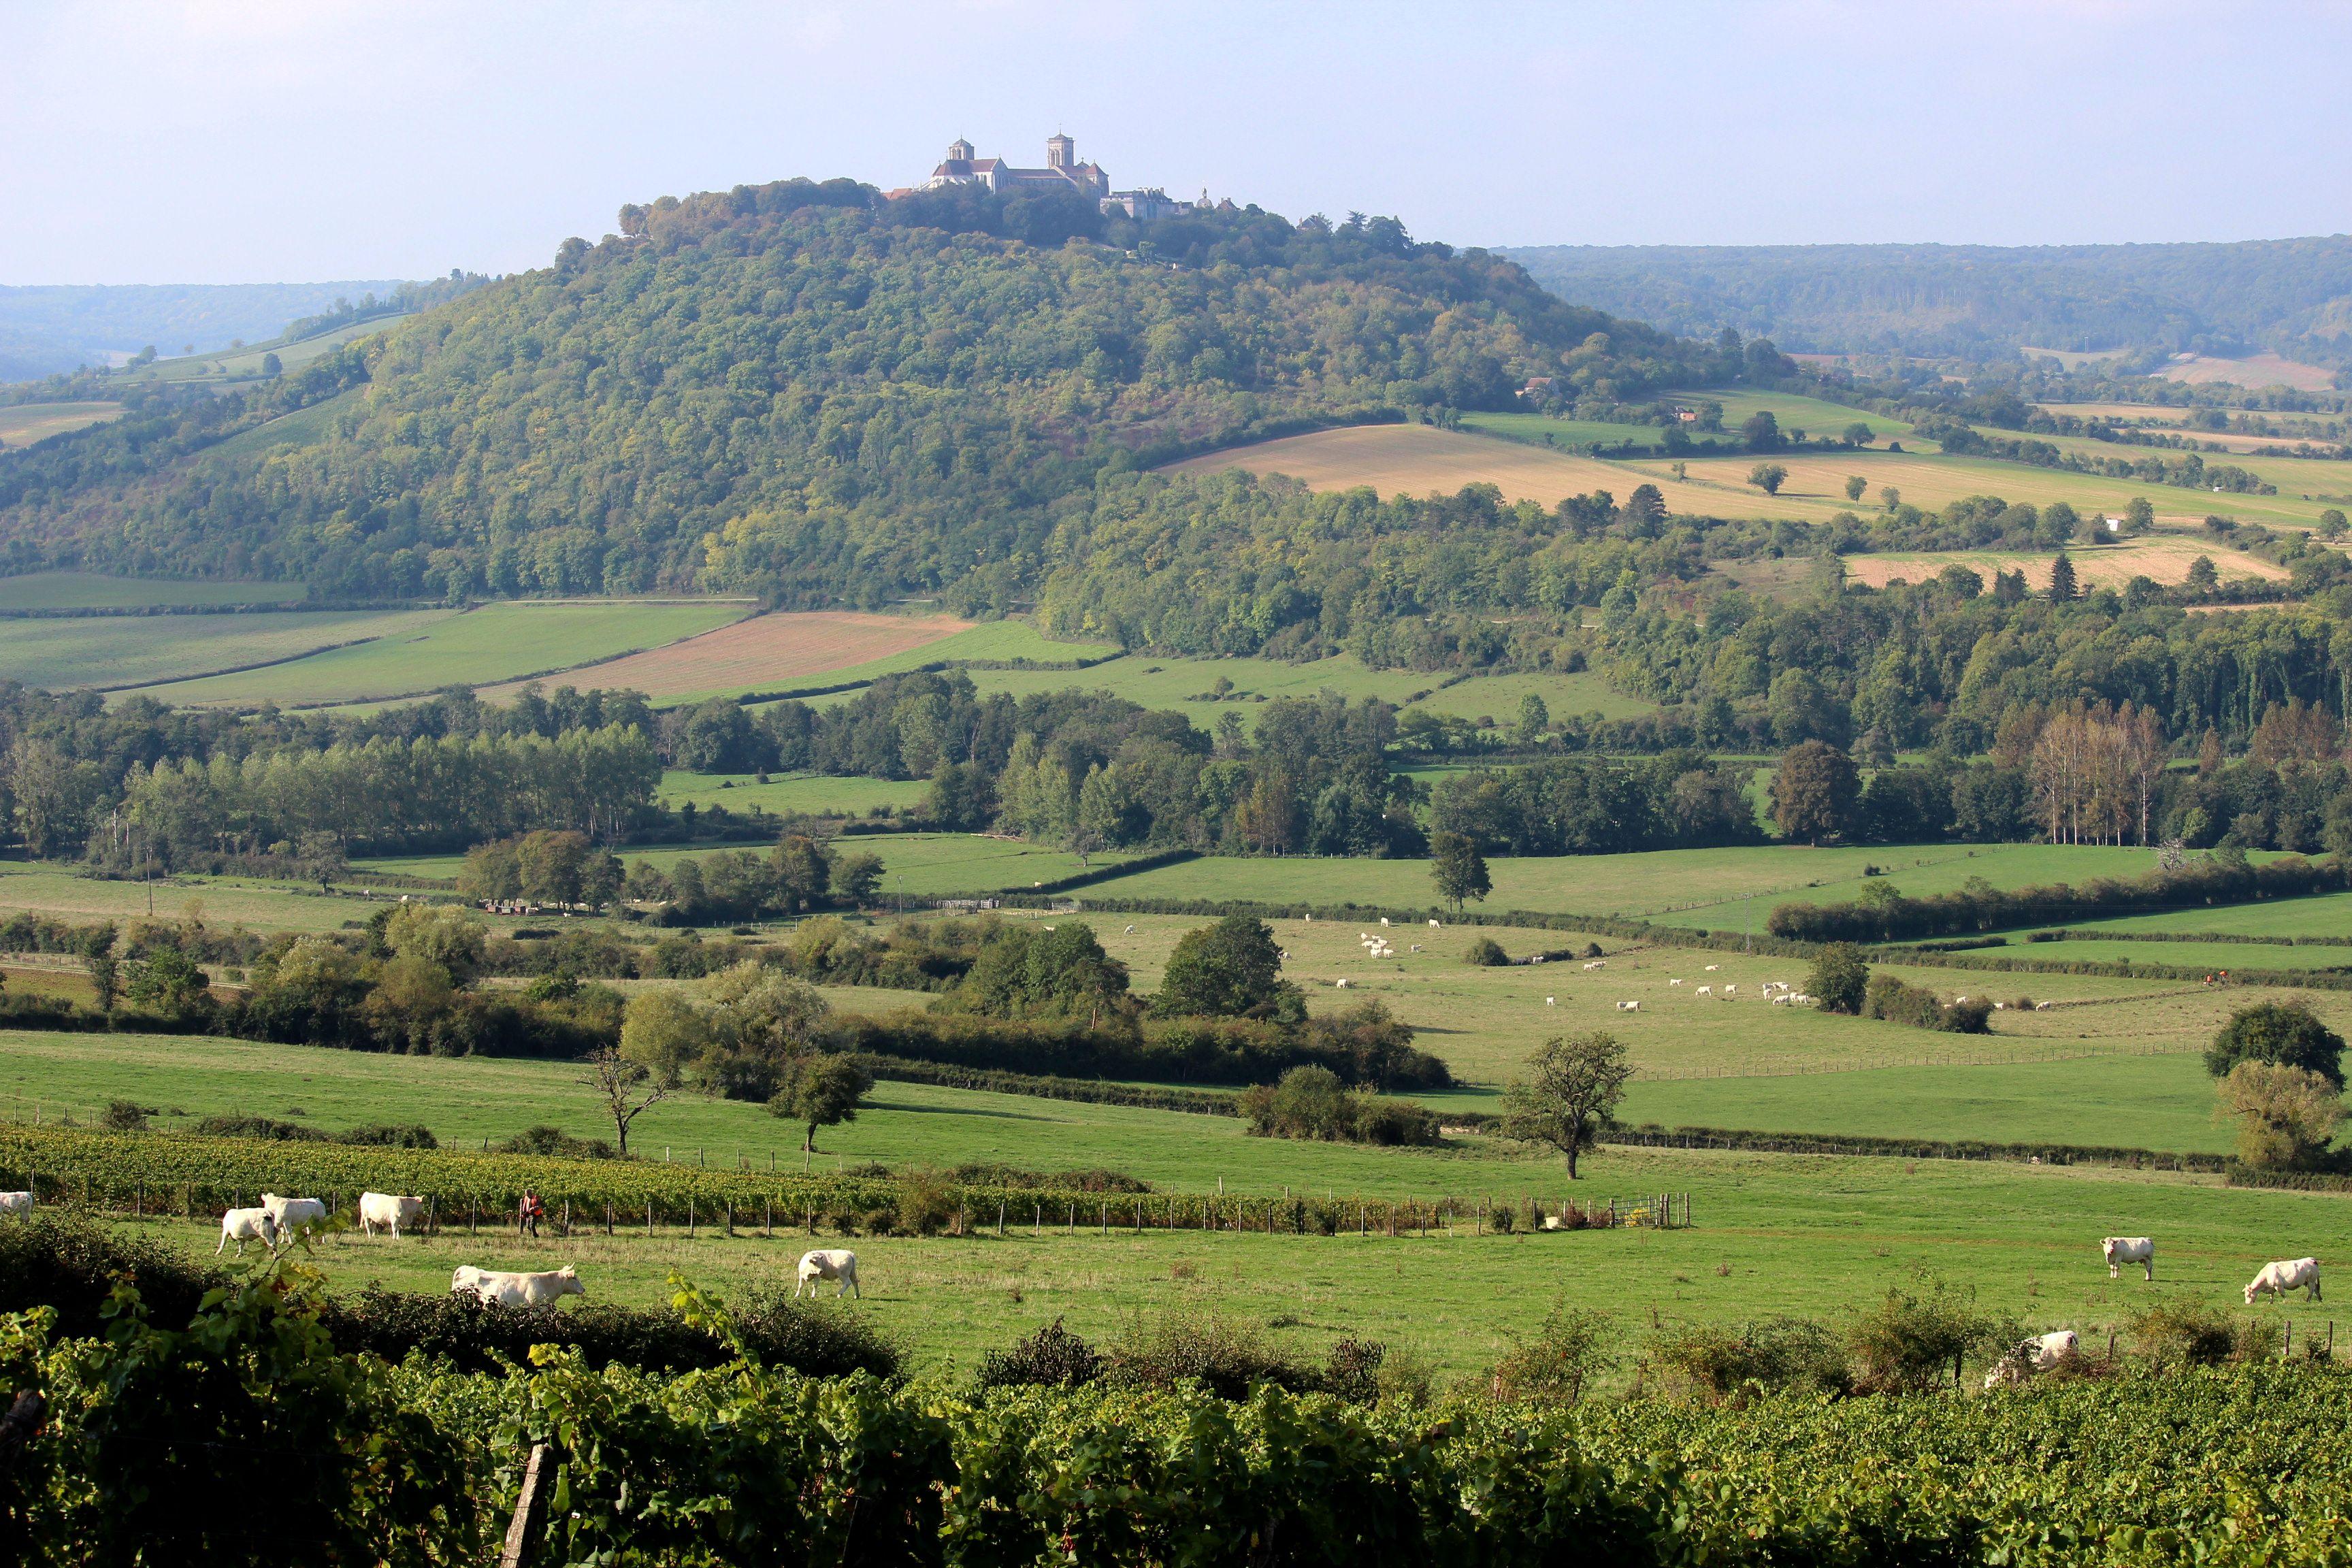 La Colline de Vézelay, côté Morvan